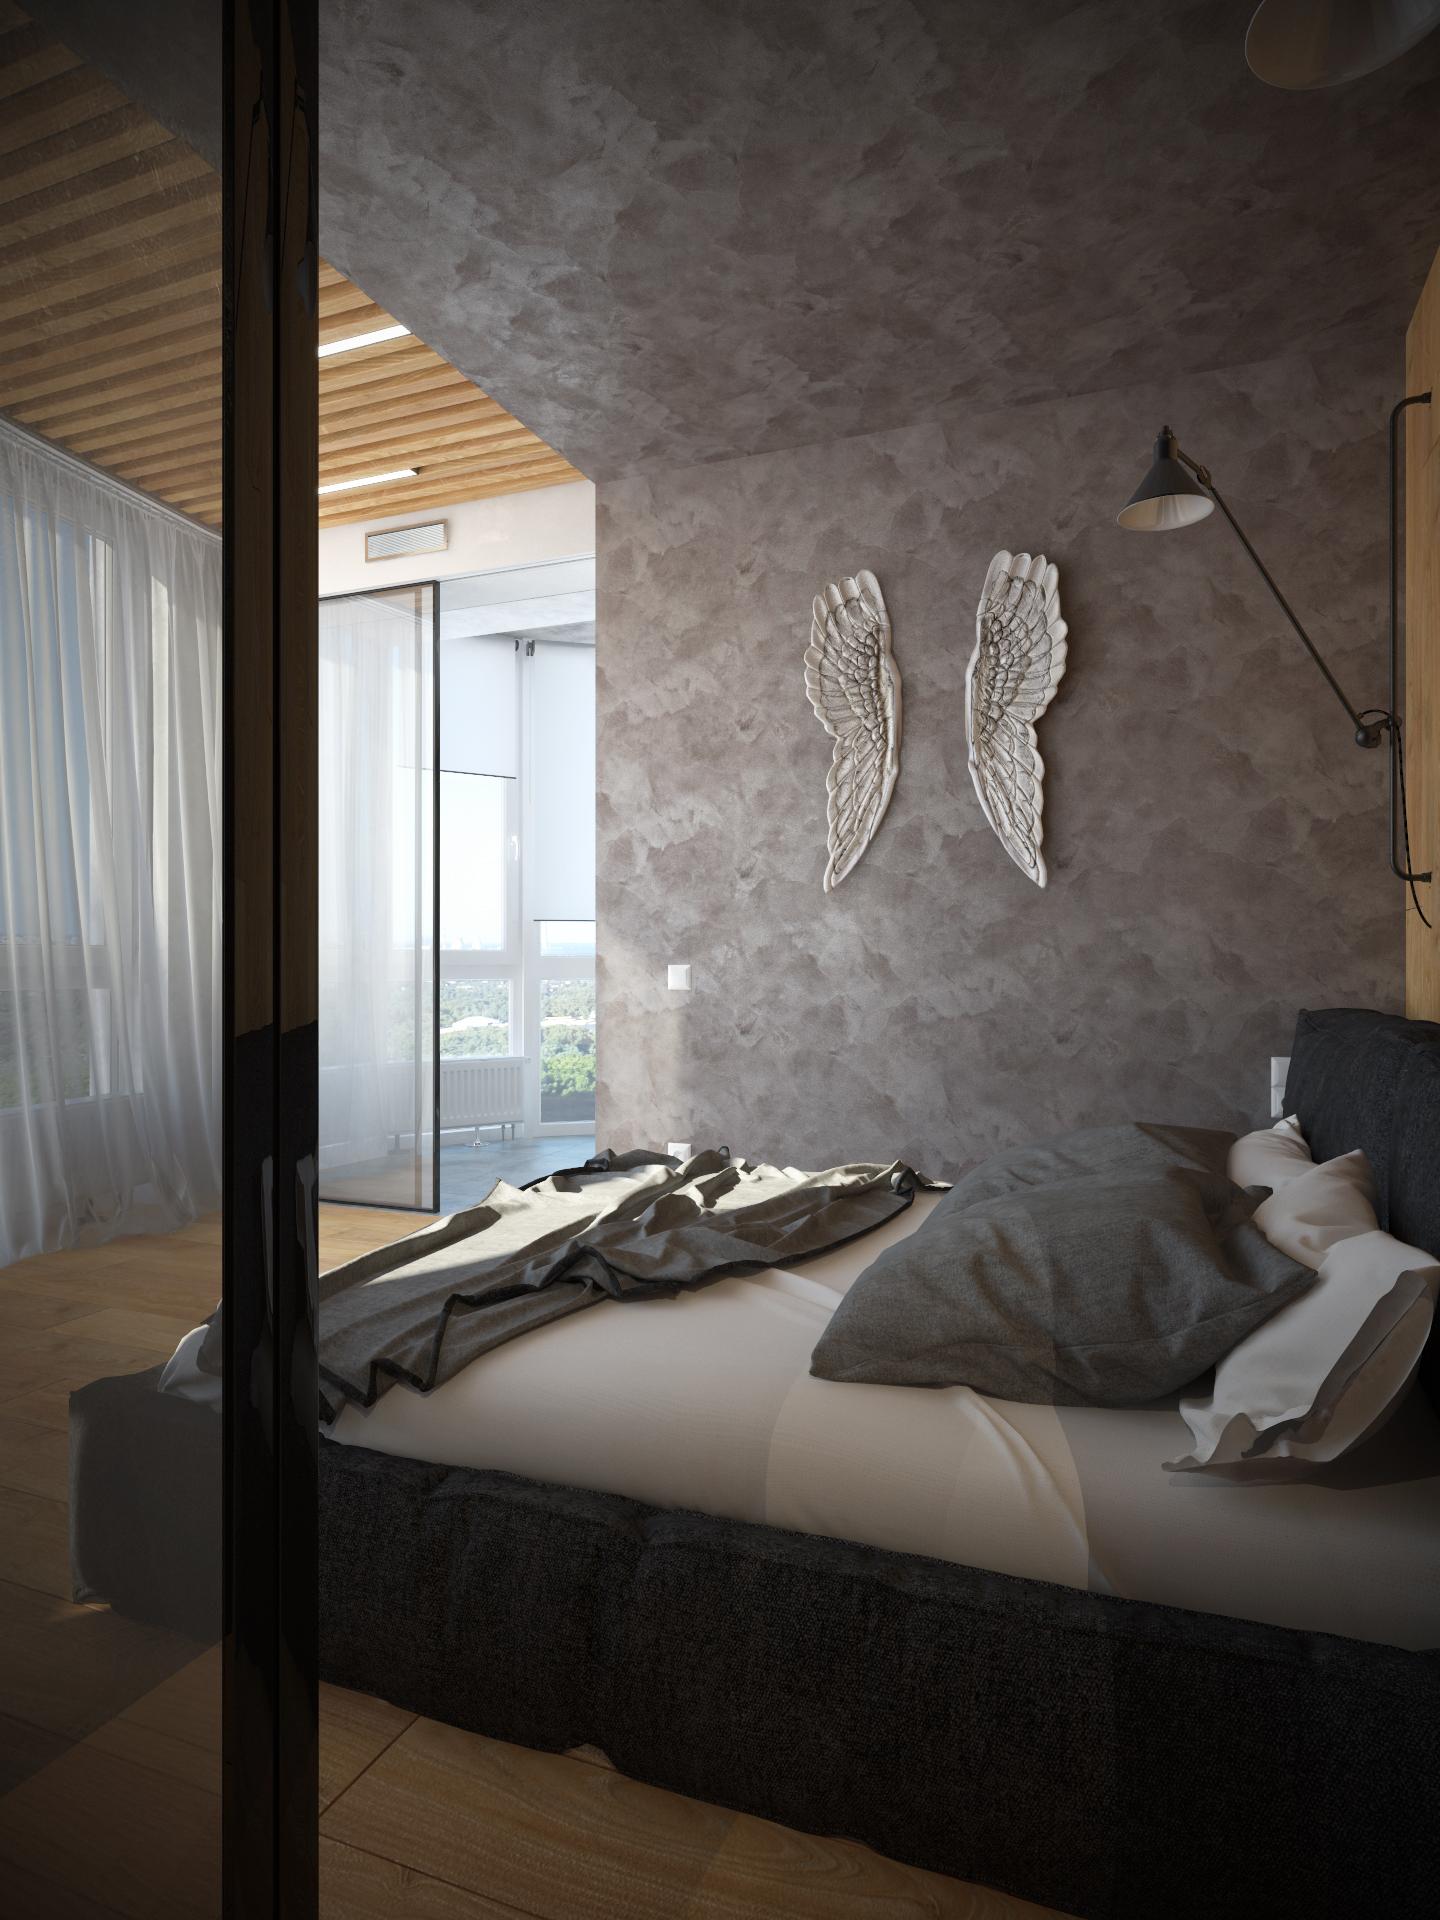 Интерьер квартиры в г. Киев. Мастер спальня